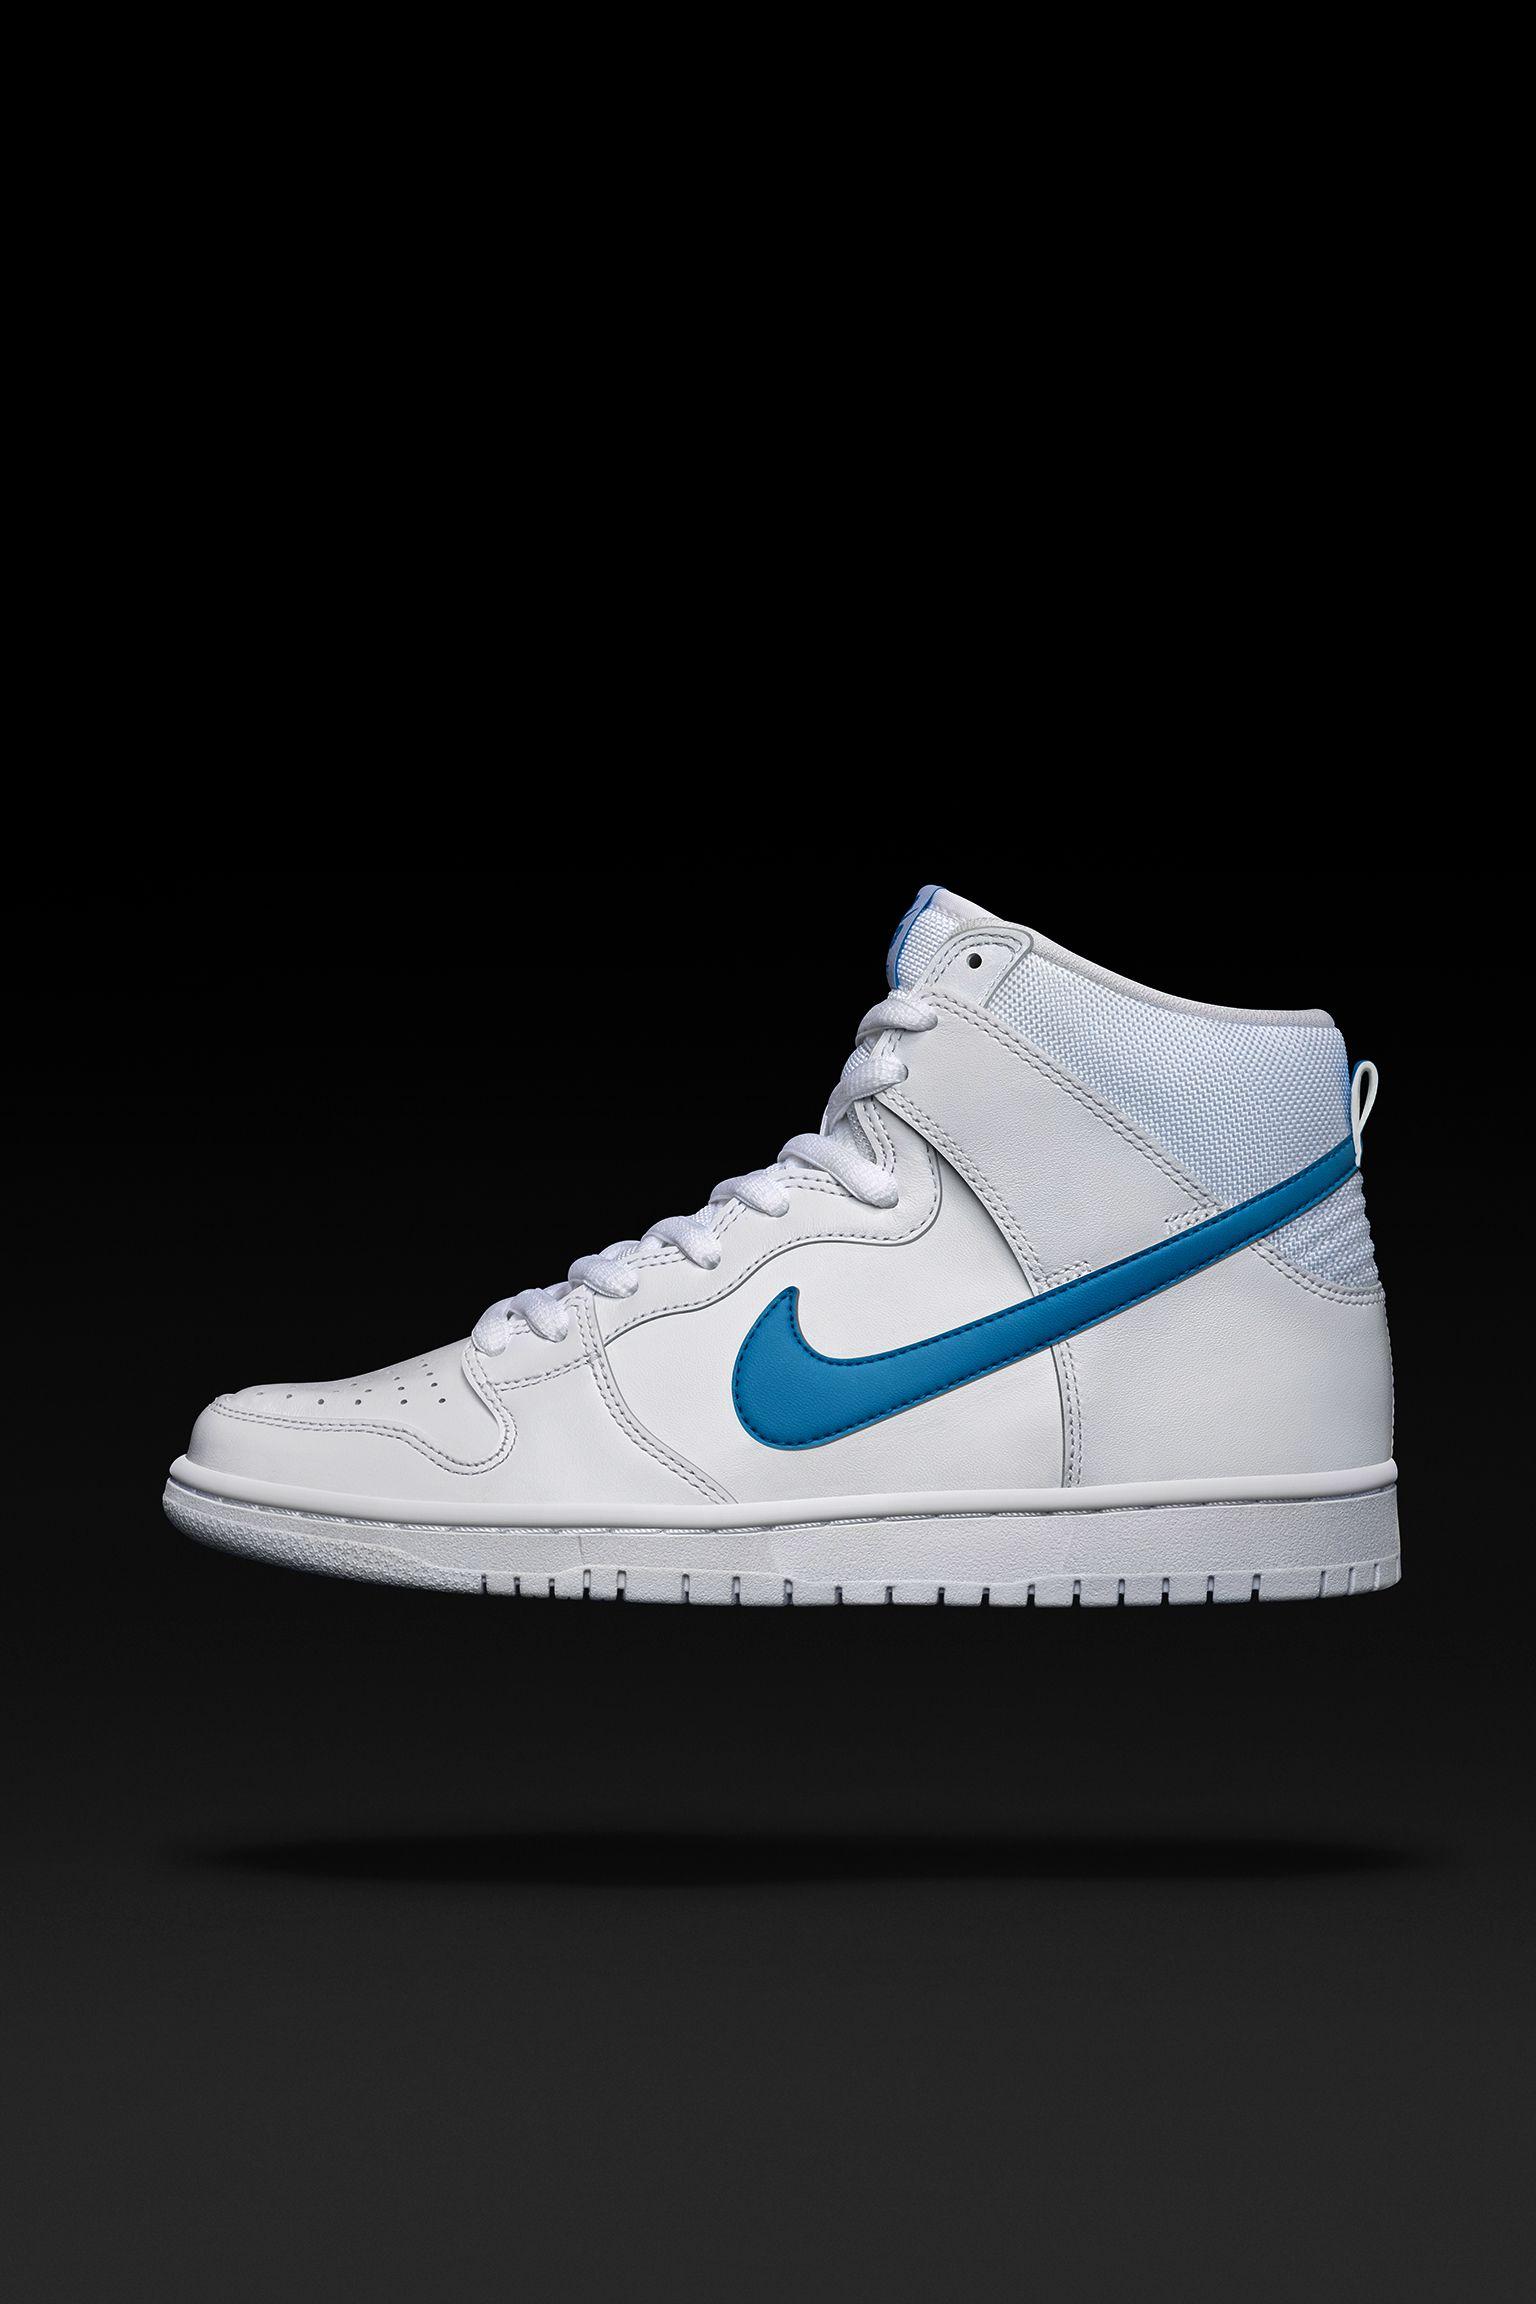 Nike SB Dunk High Pro 'Mulder'